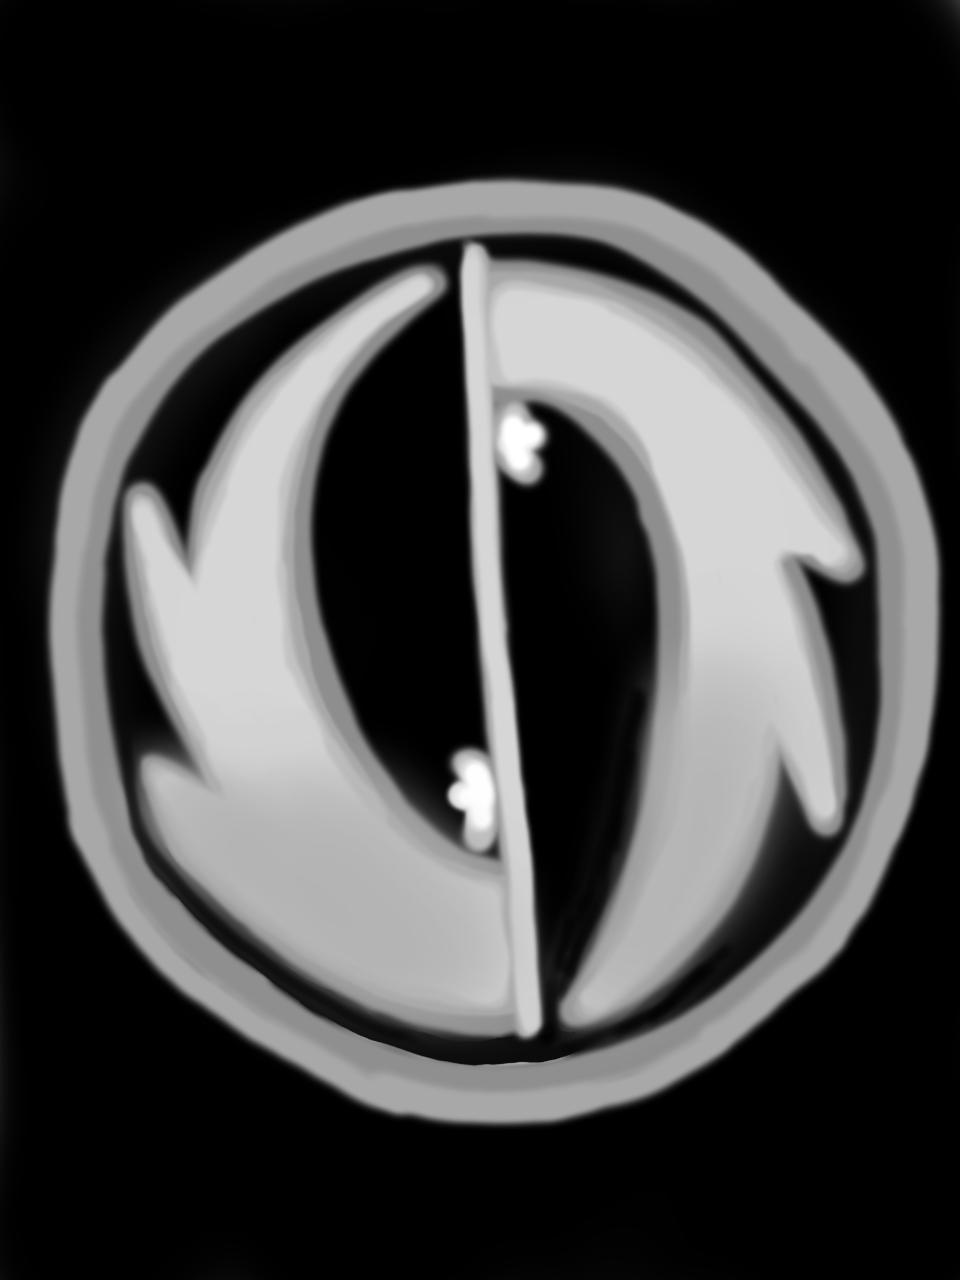 Jedicode Explore Jedicode On Deviantart